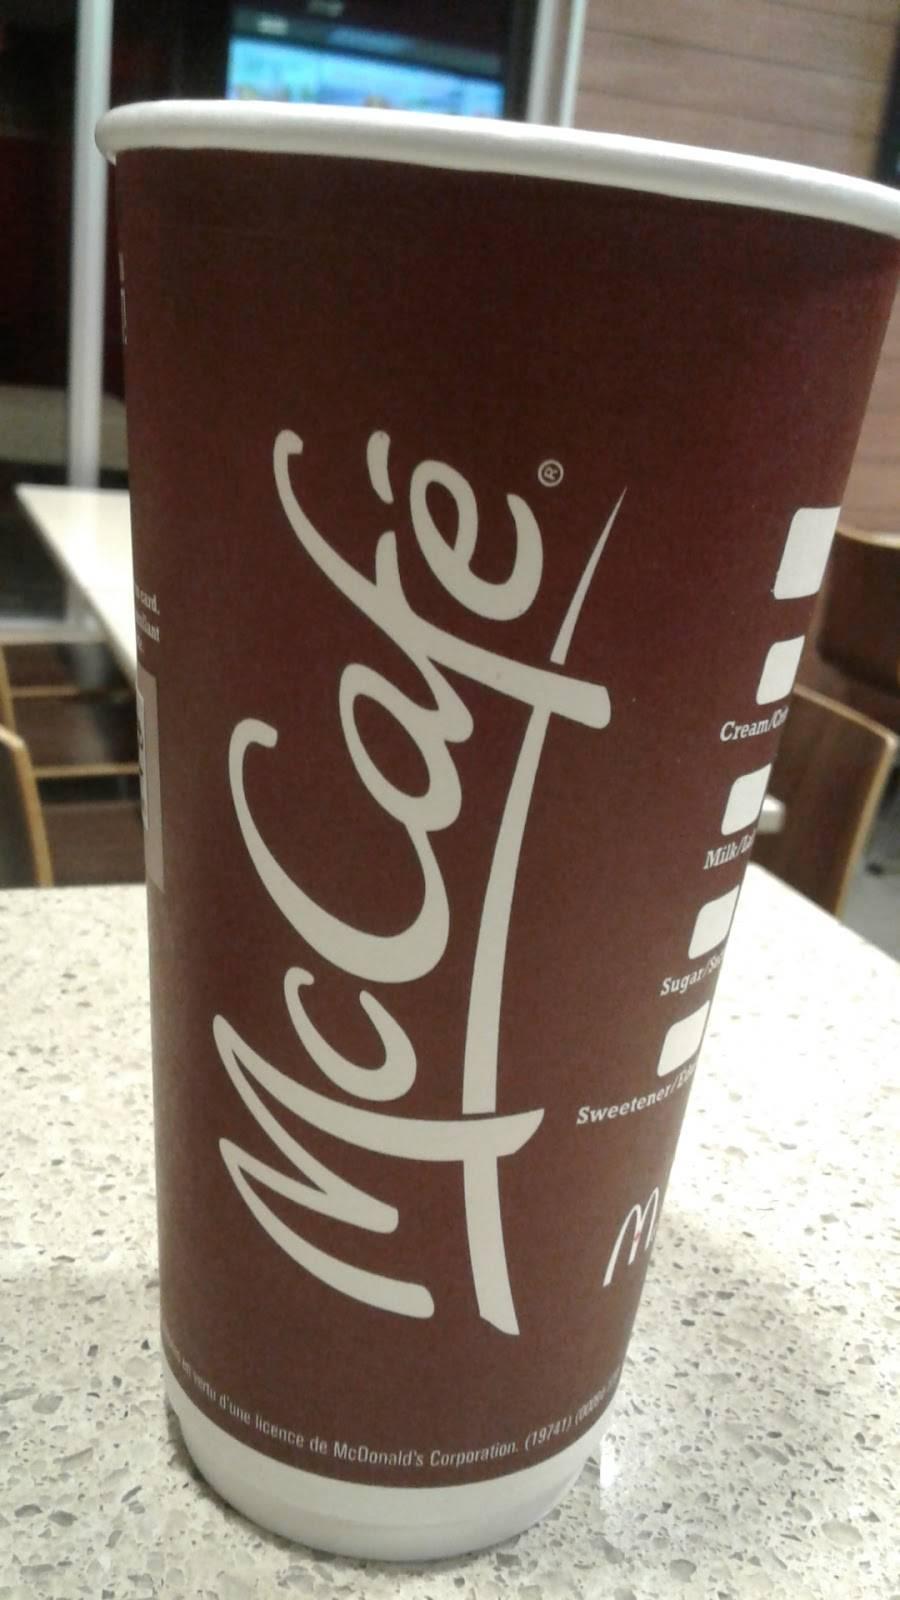 McDonalds | cafe | 3855 Rue Laval, Lac-Mégantic, QC G6B 1A7, Canada | 8195834477 OR +1 819-583-4477